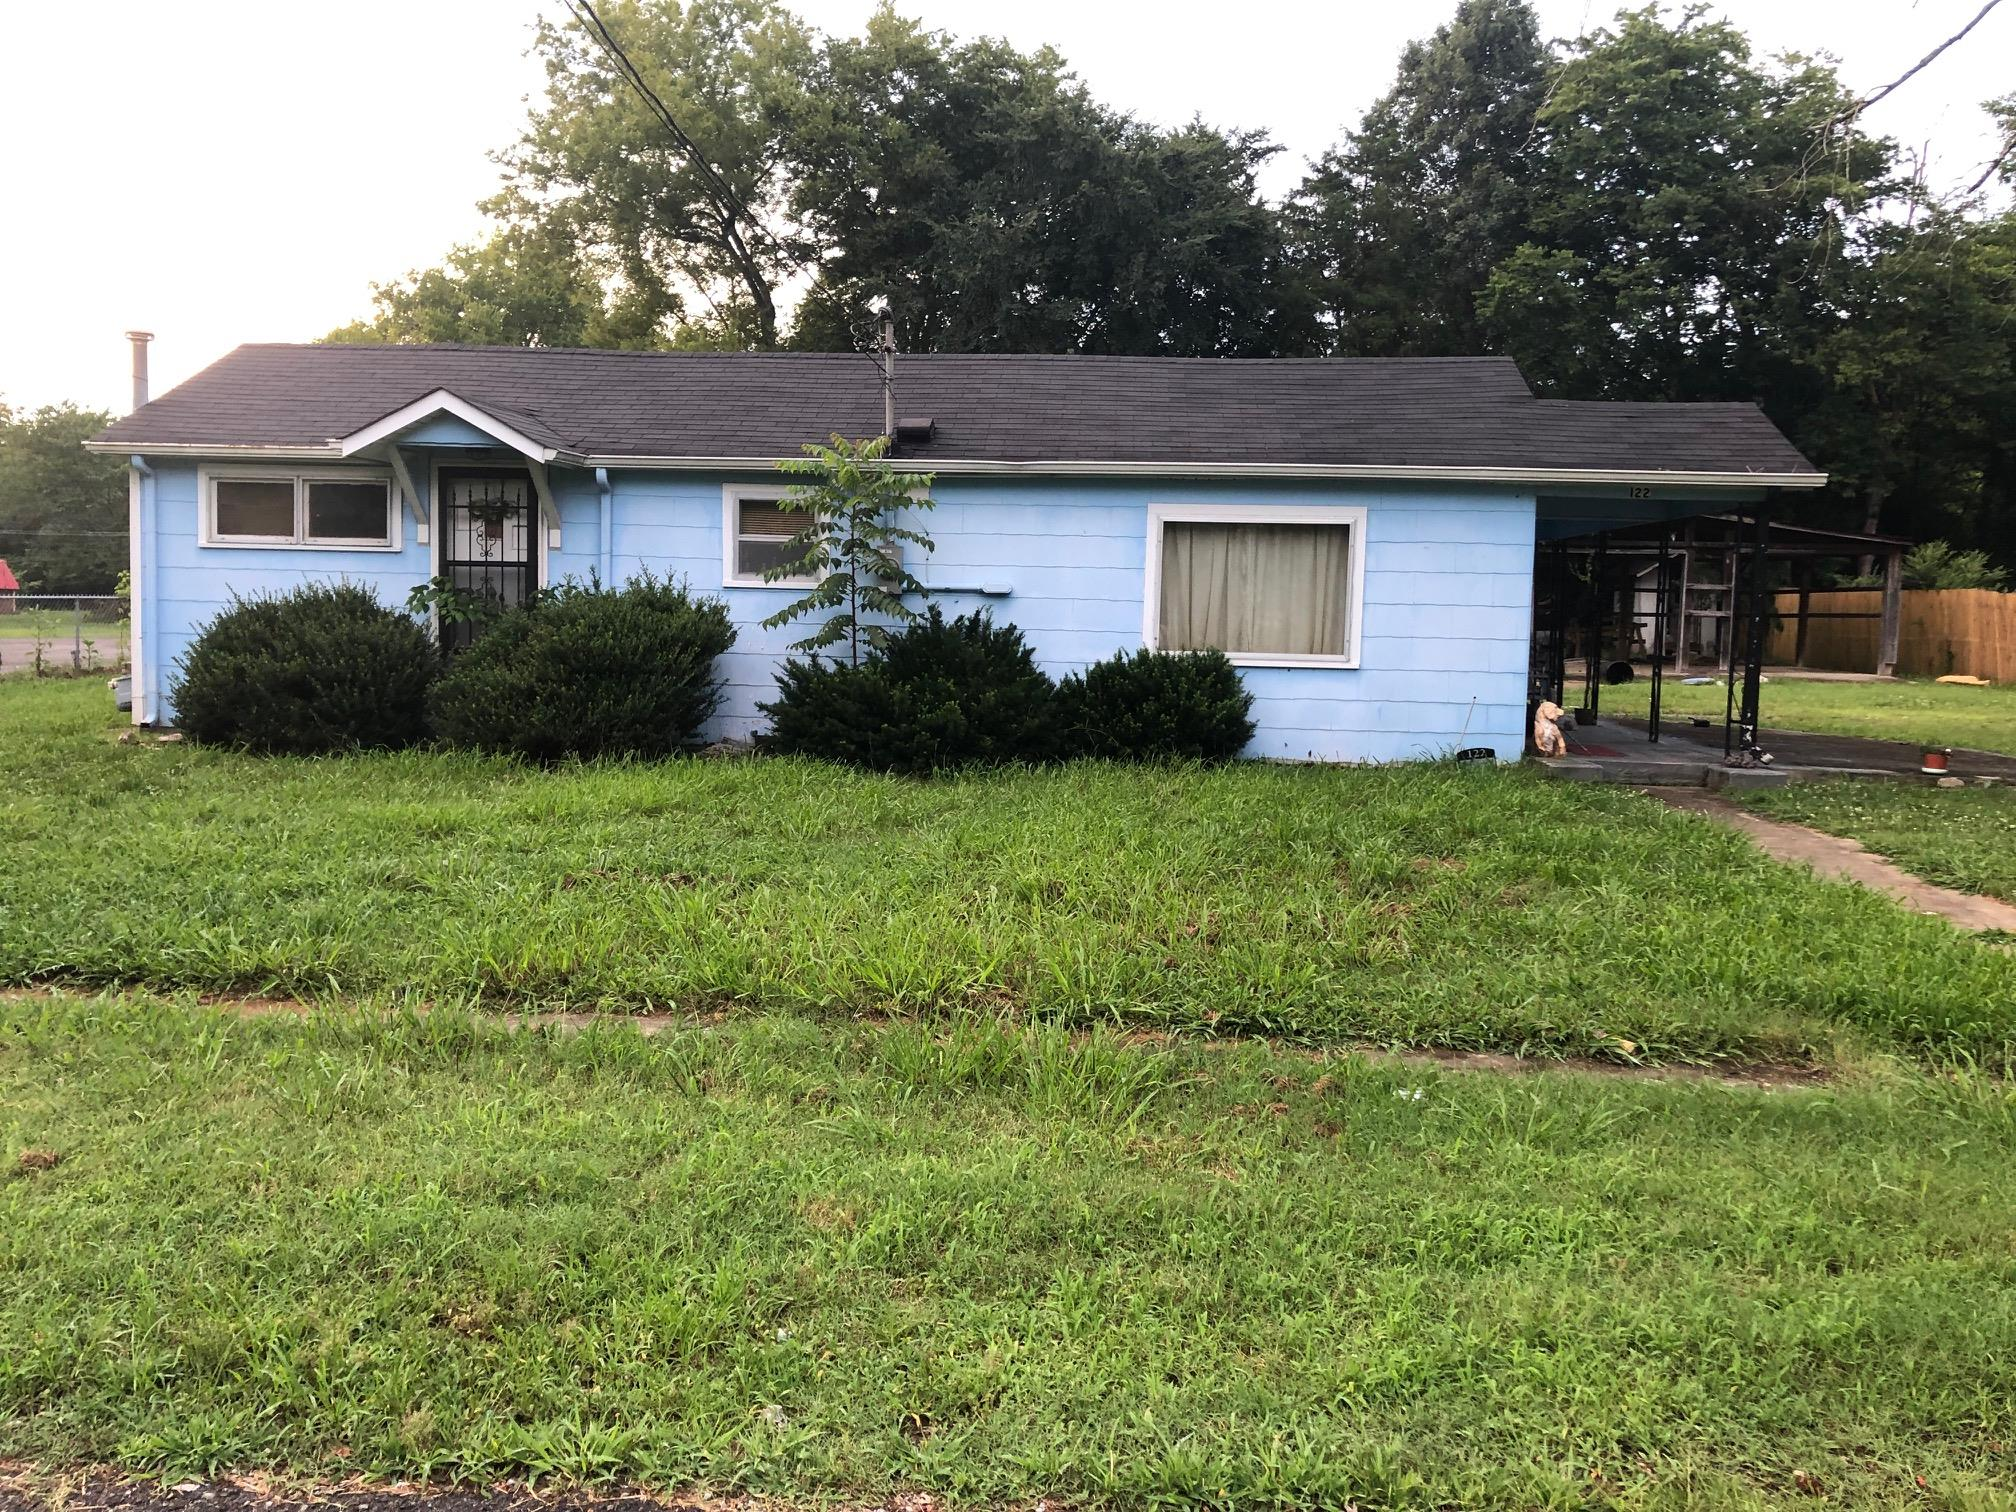 122 Shapard St, Shelbyville, TN 37160 - Shelbyville, TN real estate listing